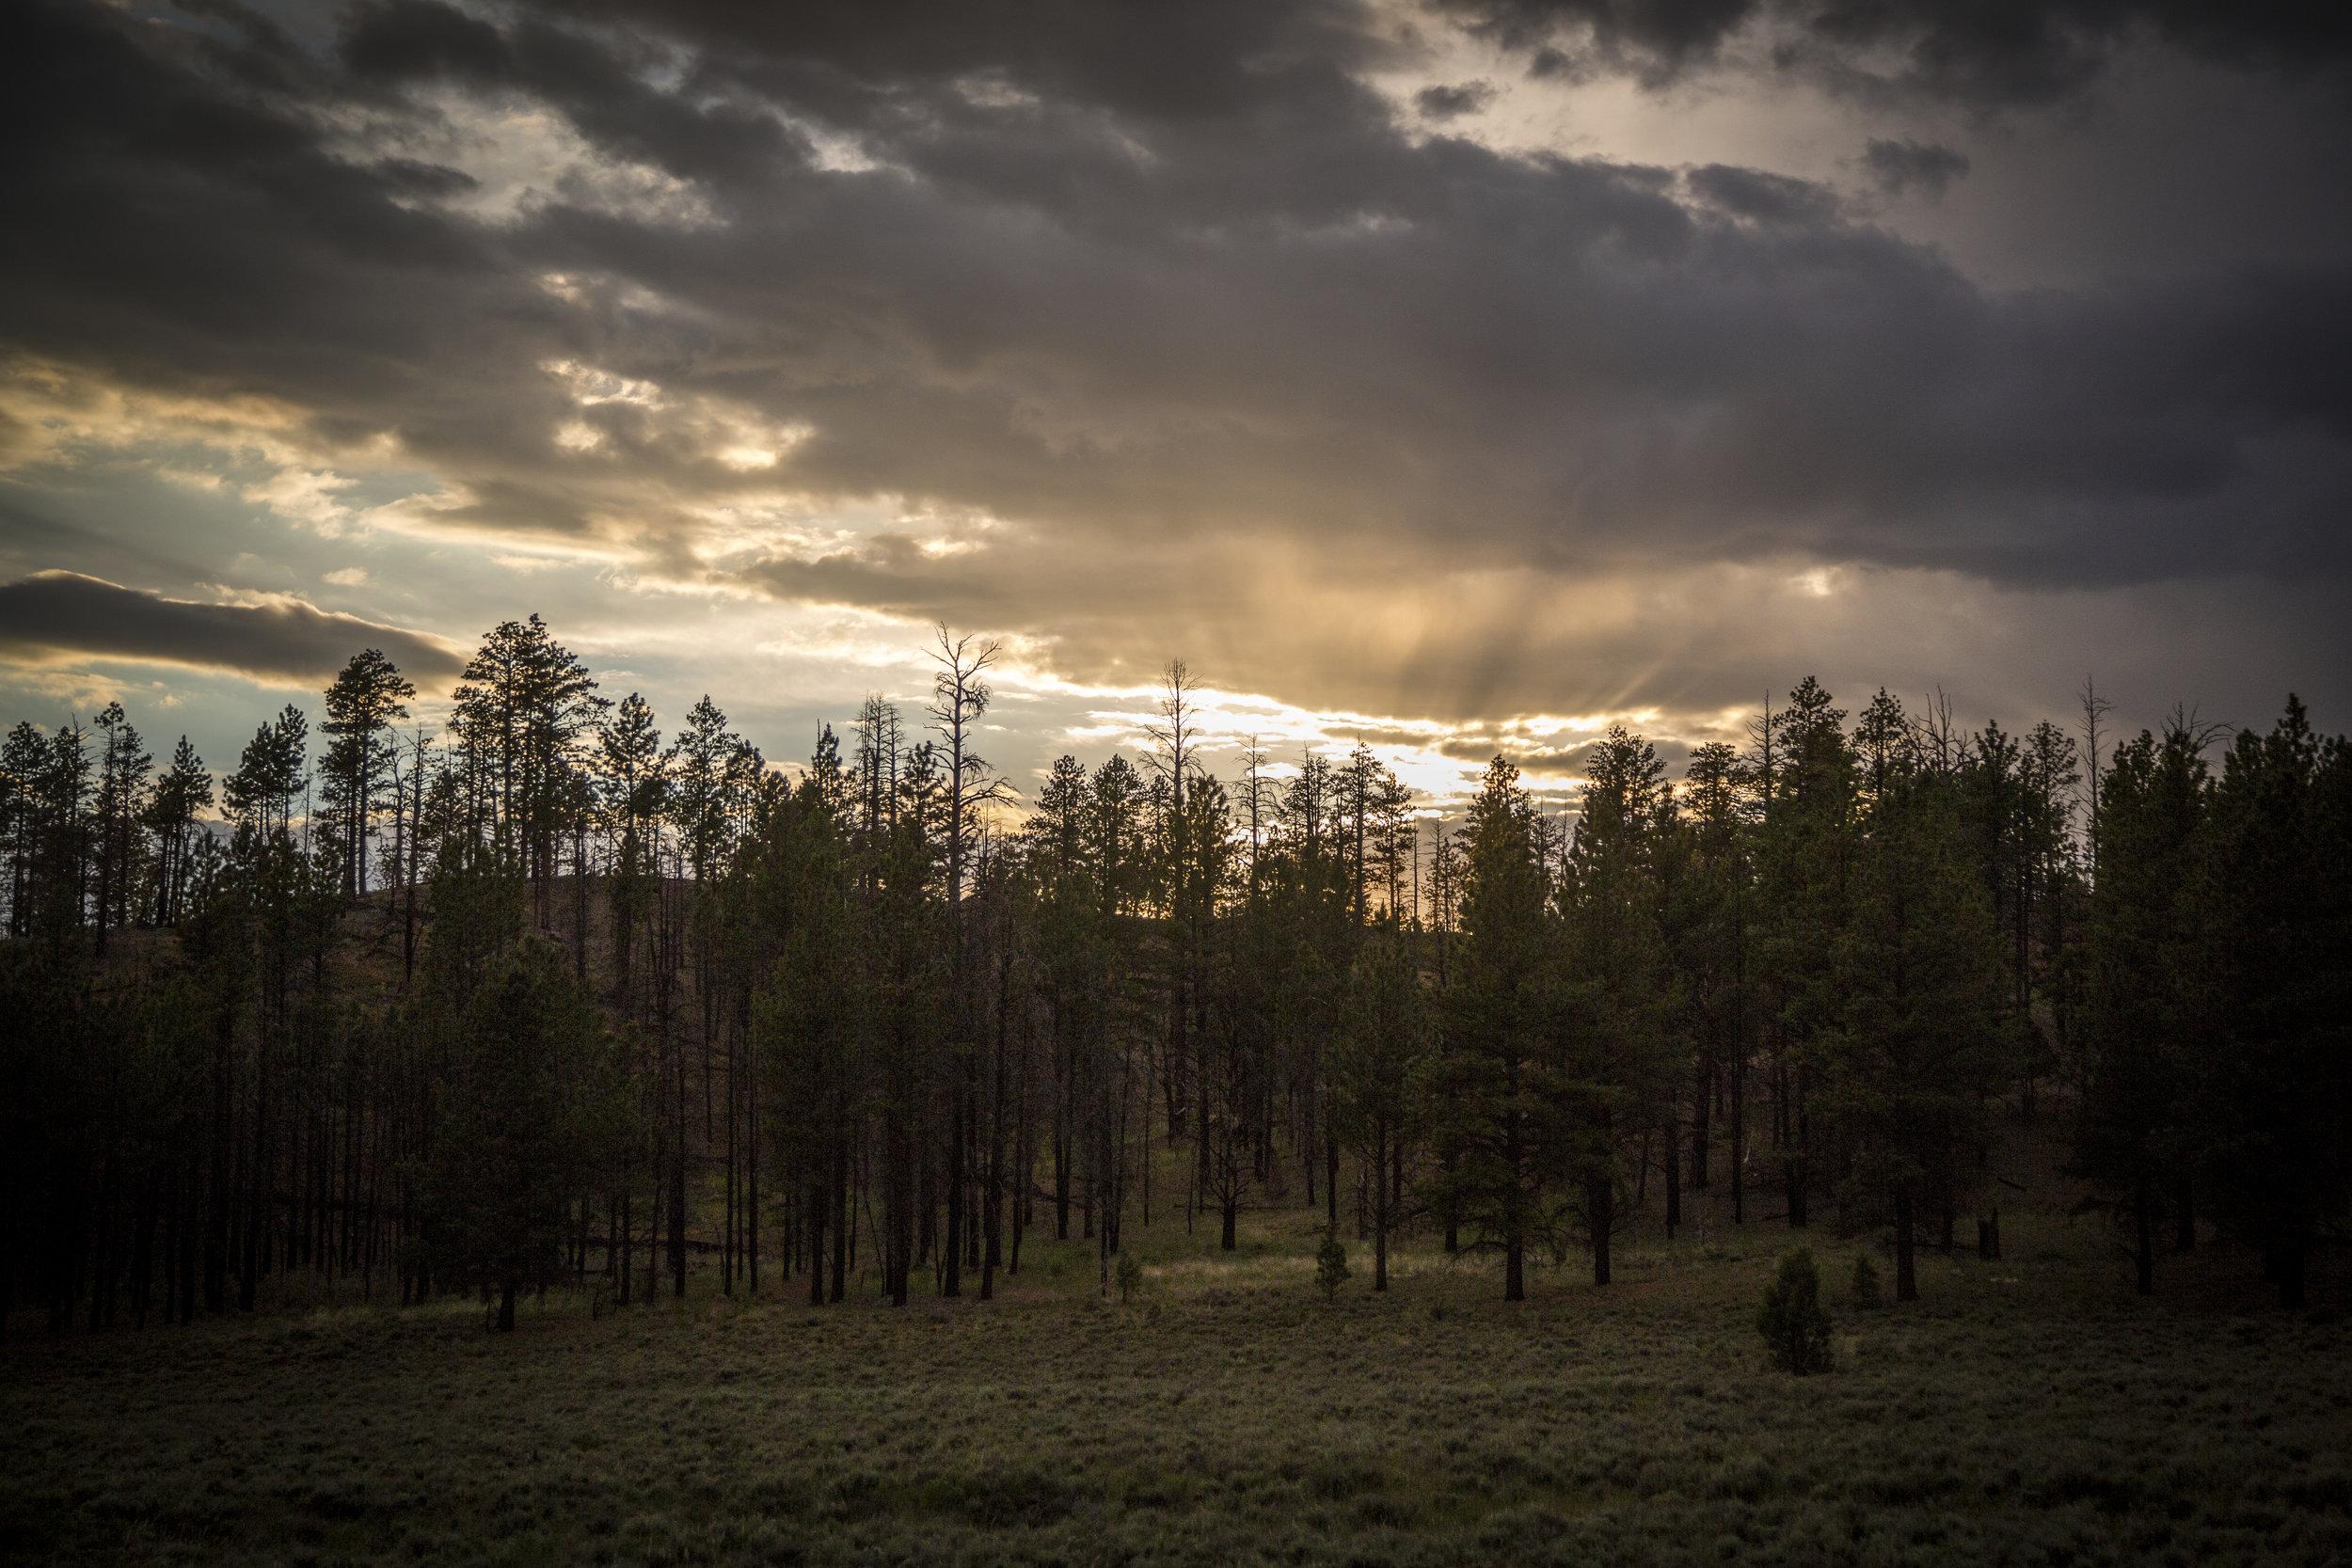 Sunrise - Bryce Canyon